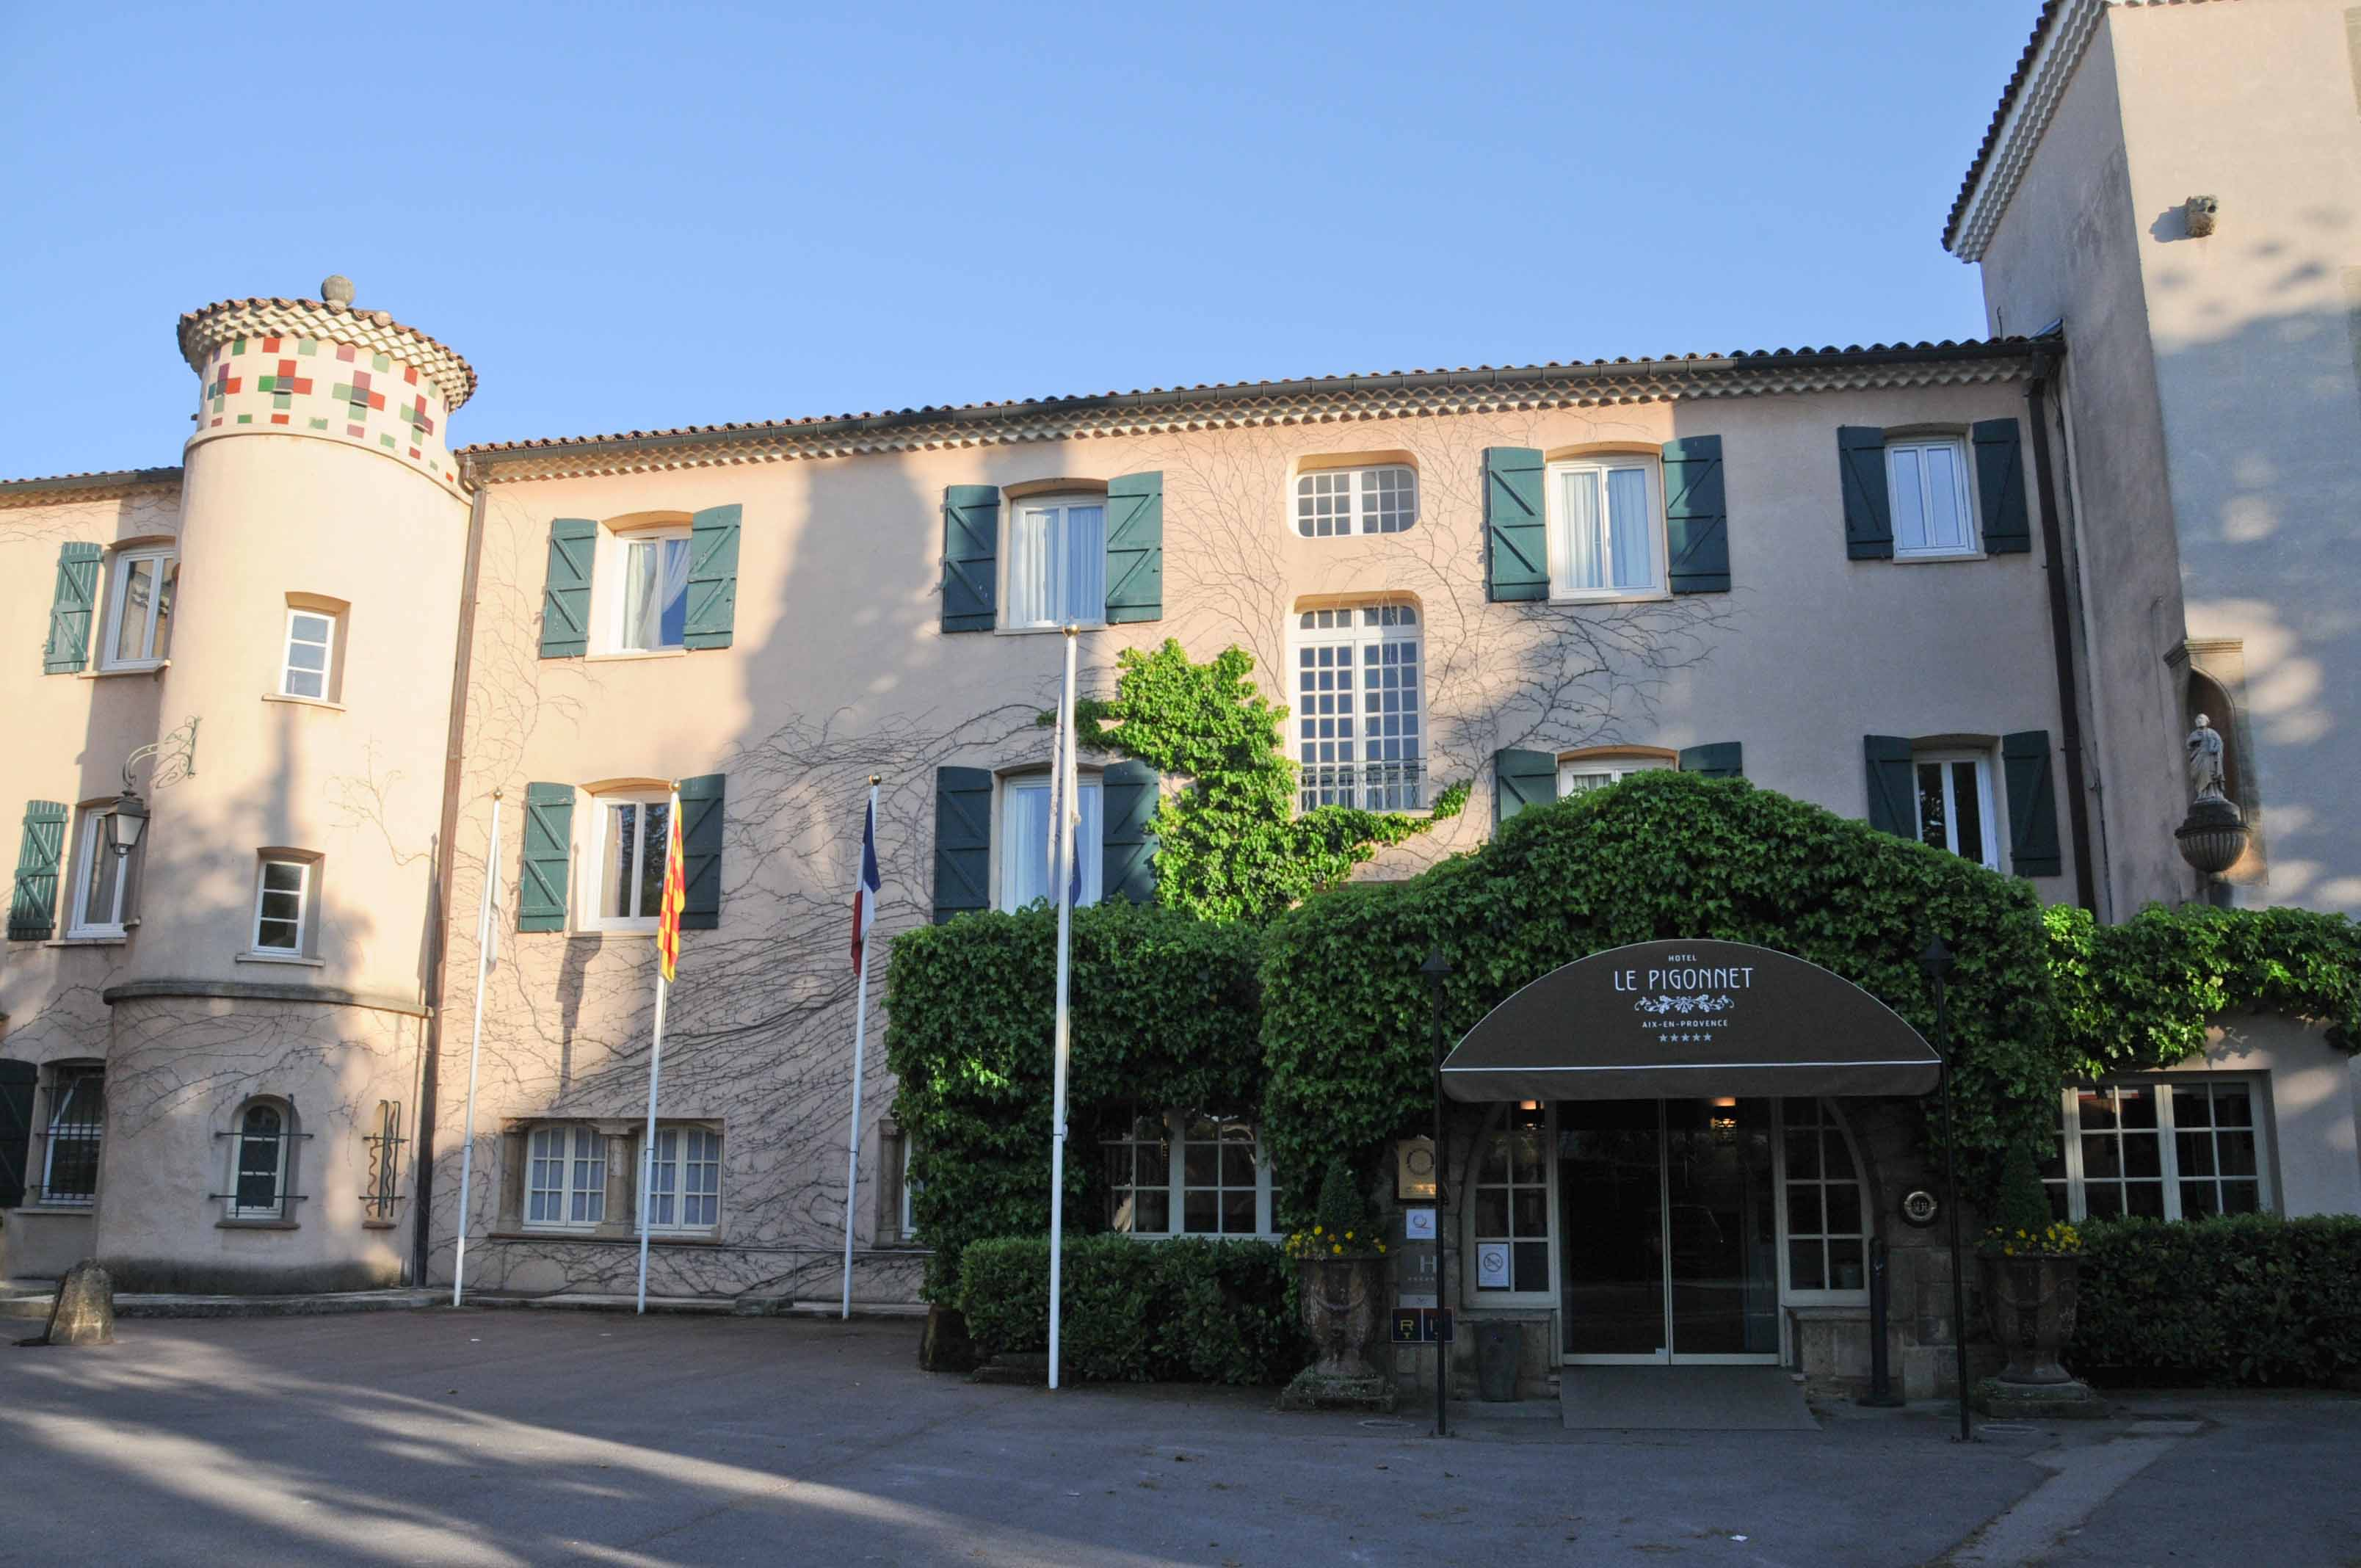 Restaurant le pigonnet mickael f val for Hotels 2 etoiles aix en provence